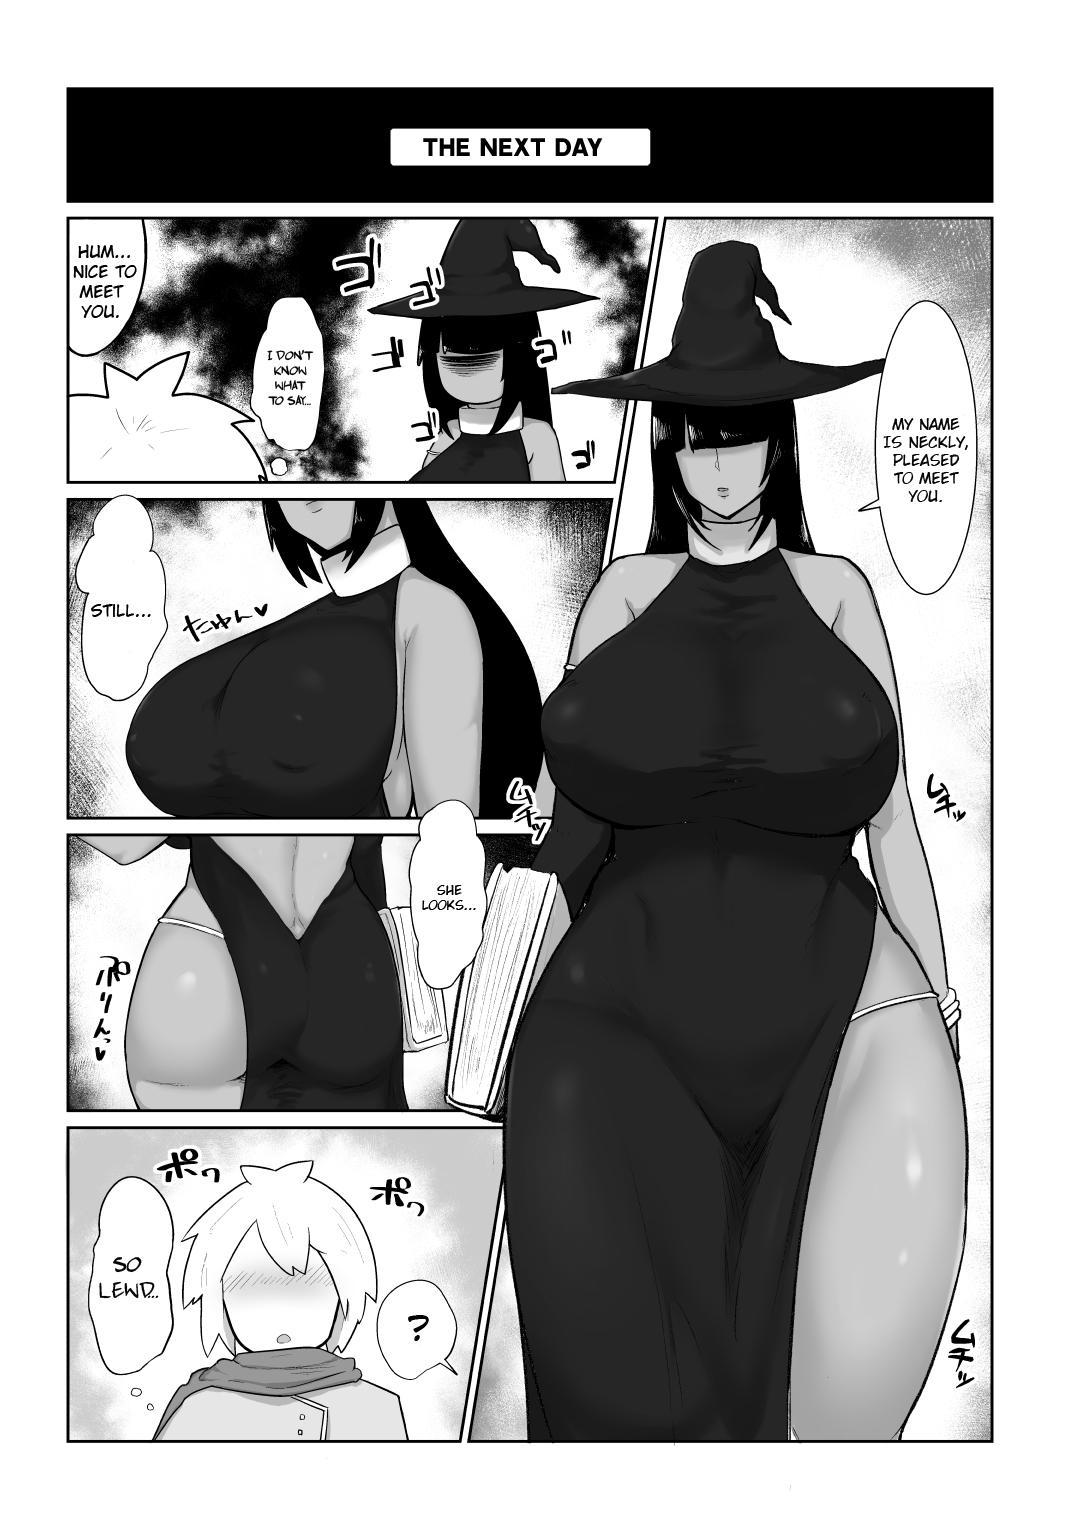 [Initiative (Fujoujoshi)] Party ni Yatotta Mahoutsukai ni Musekinin Tanetsuke Suru Hanashi | Hiring a mage to breed her irresponsibly [English] (RhinocerosBeetle] 7